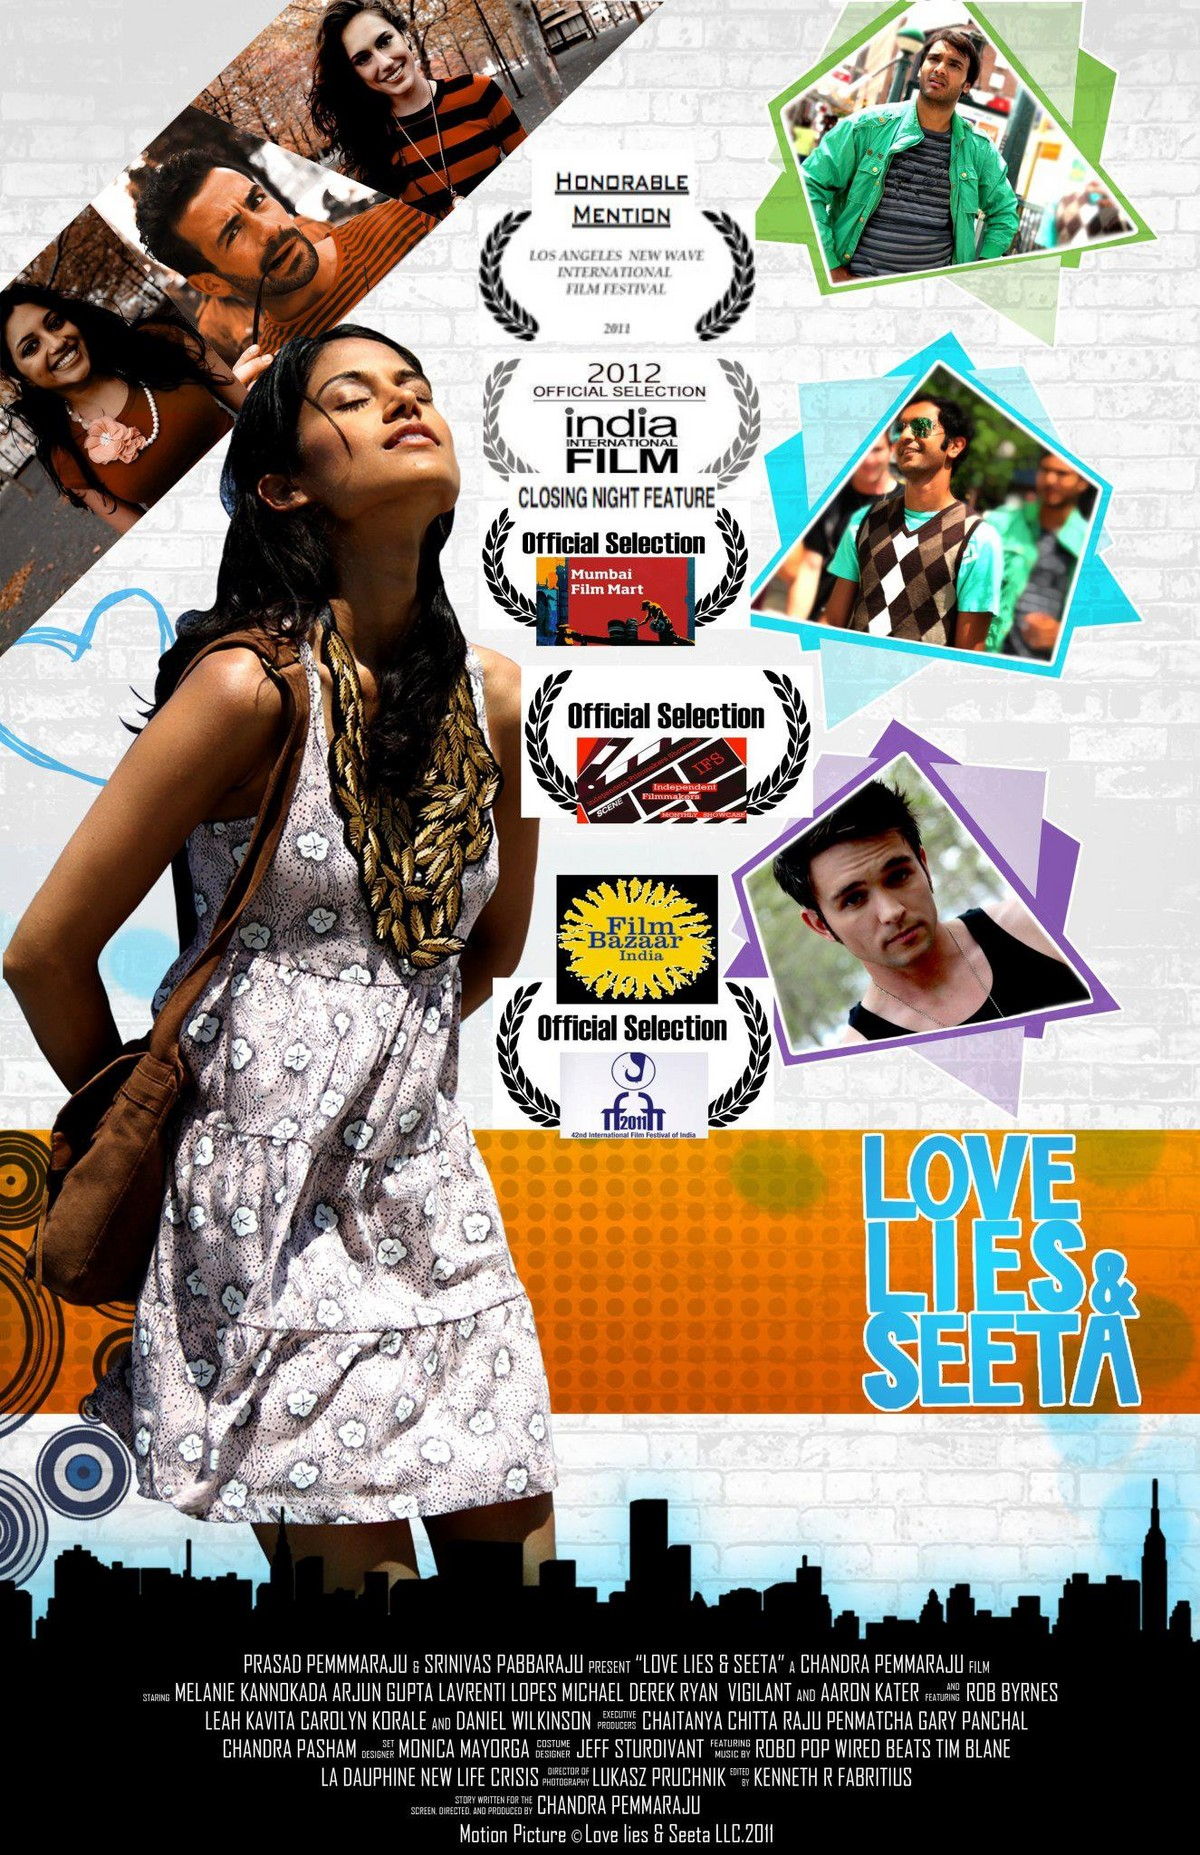 Love Lies and Seeta - Movie Poster #2 (Original)